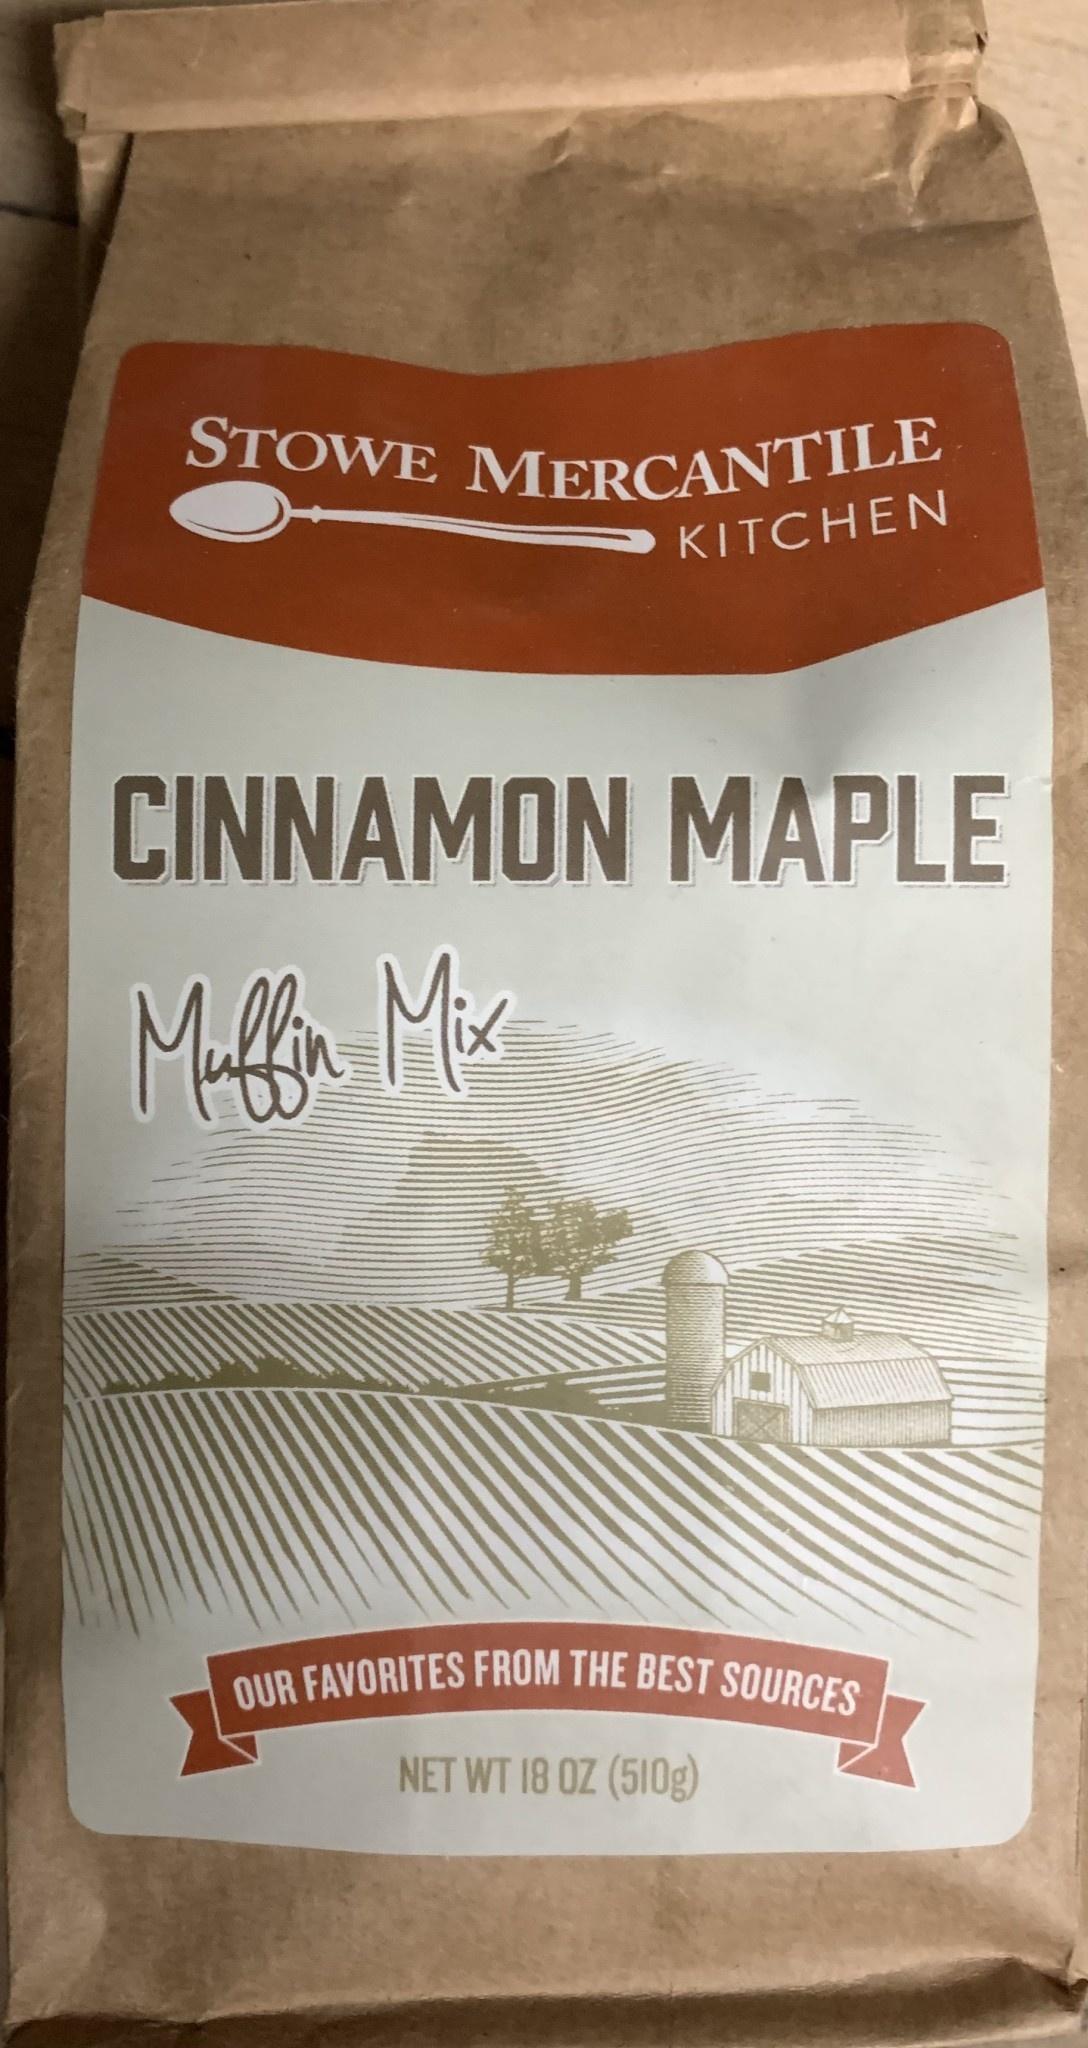 Stowe Mercantile Kitchen Muffin Mix - Cinnamon Maple